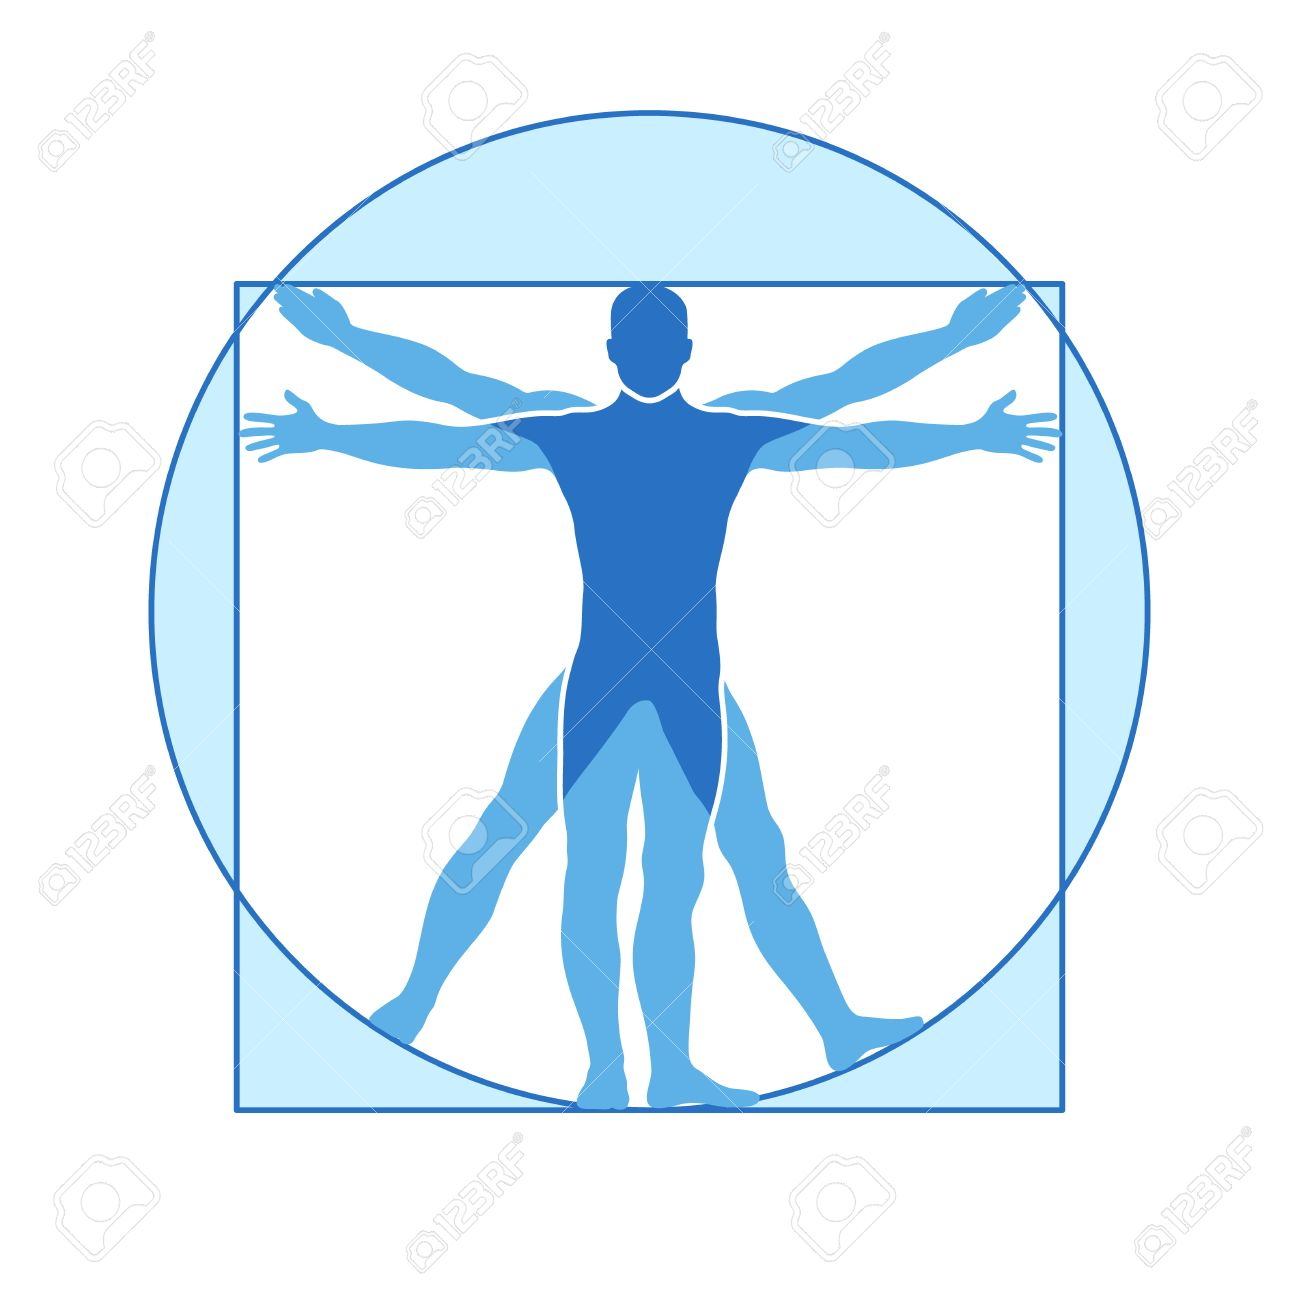 Human body vector icon of vitruvian man. Famous leonardo da vinci image vitruvian man, classic proportion form man illustration - 66411190